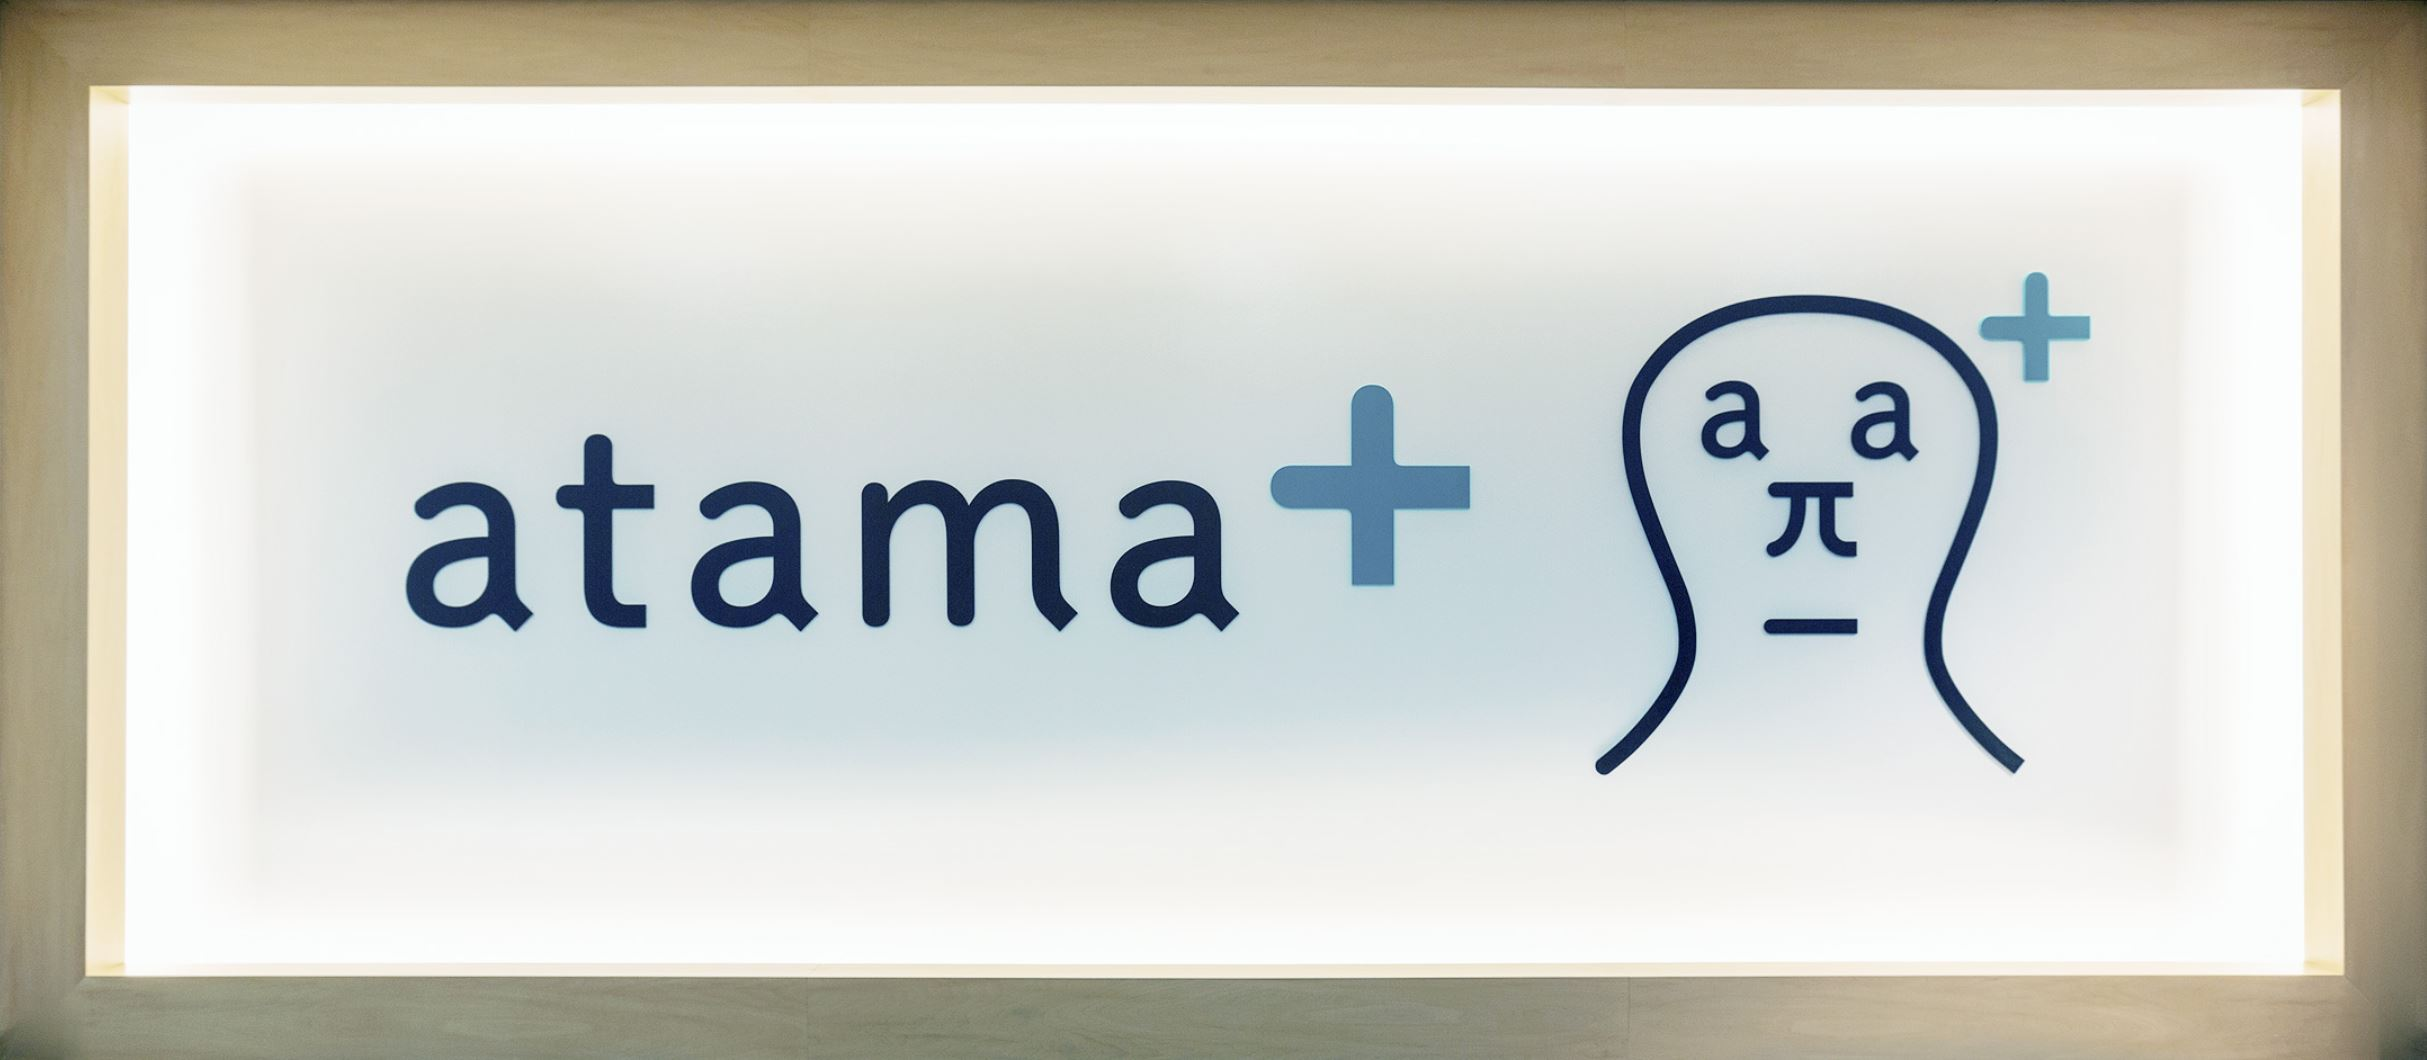 atama plusホーム画面